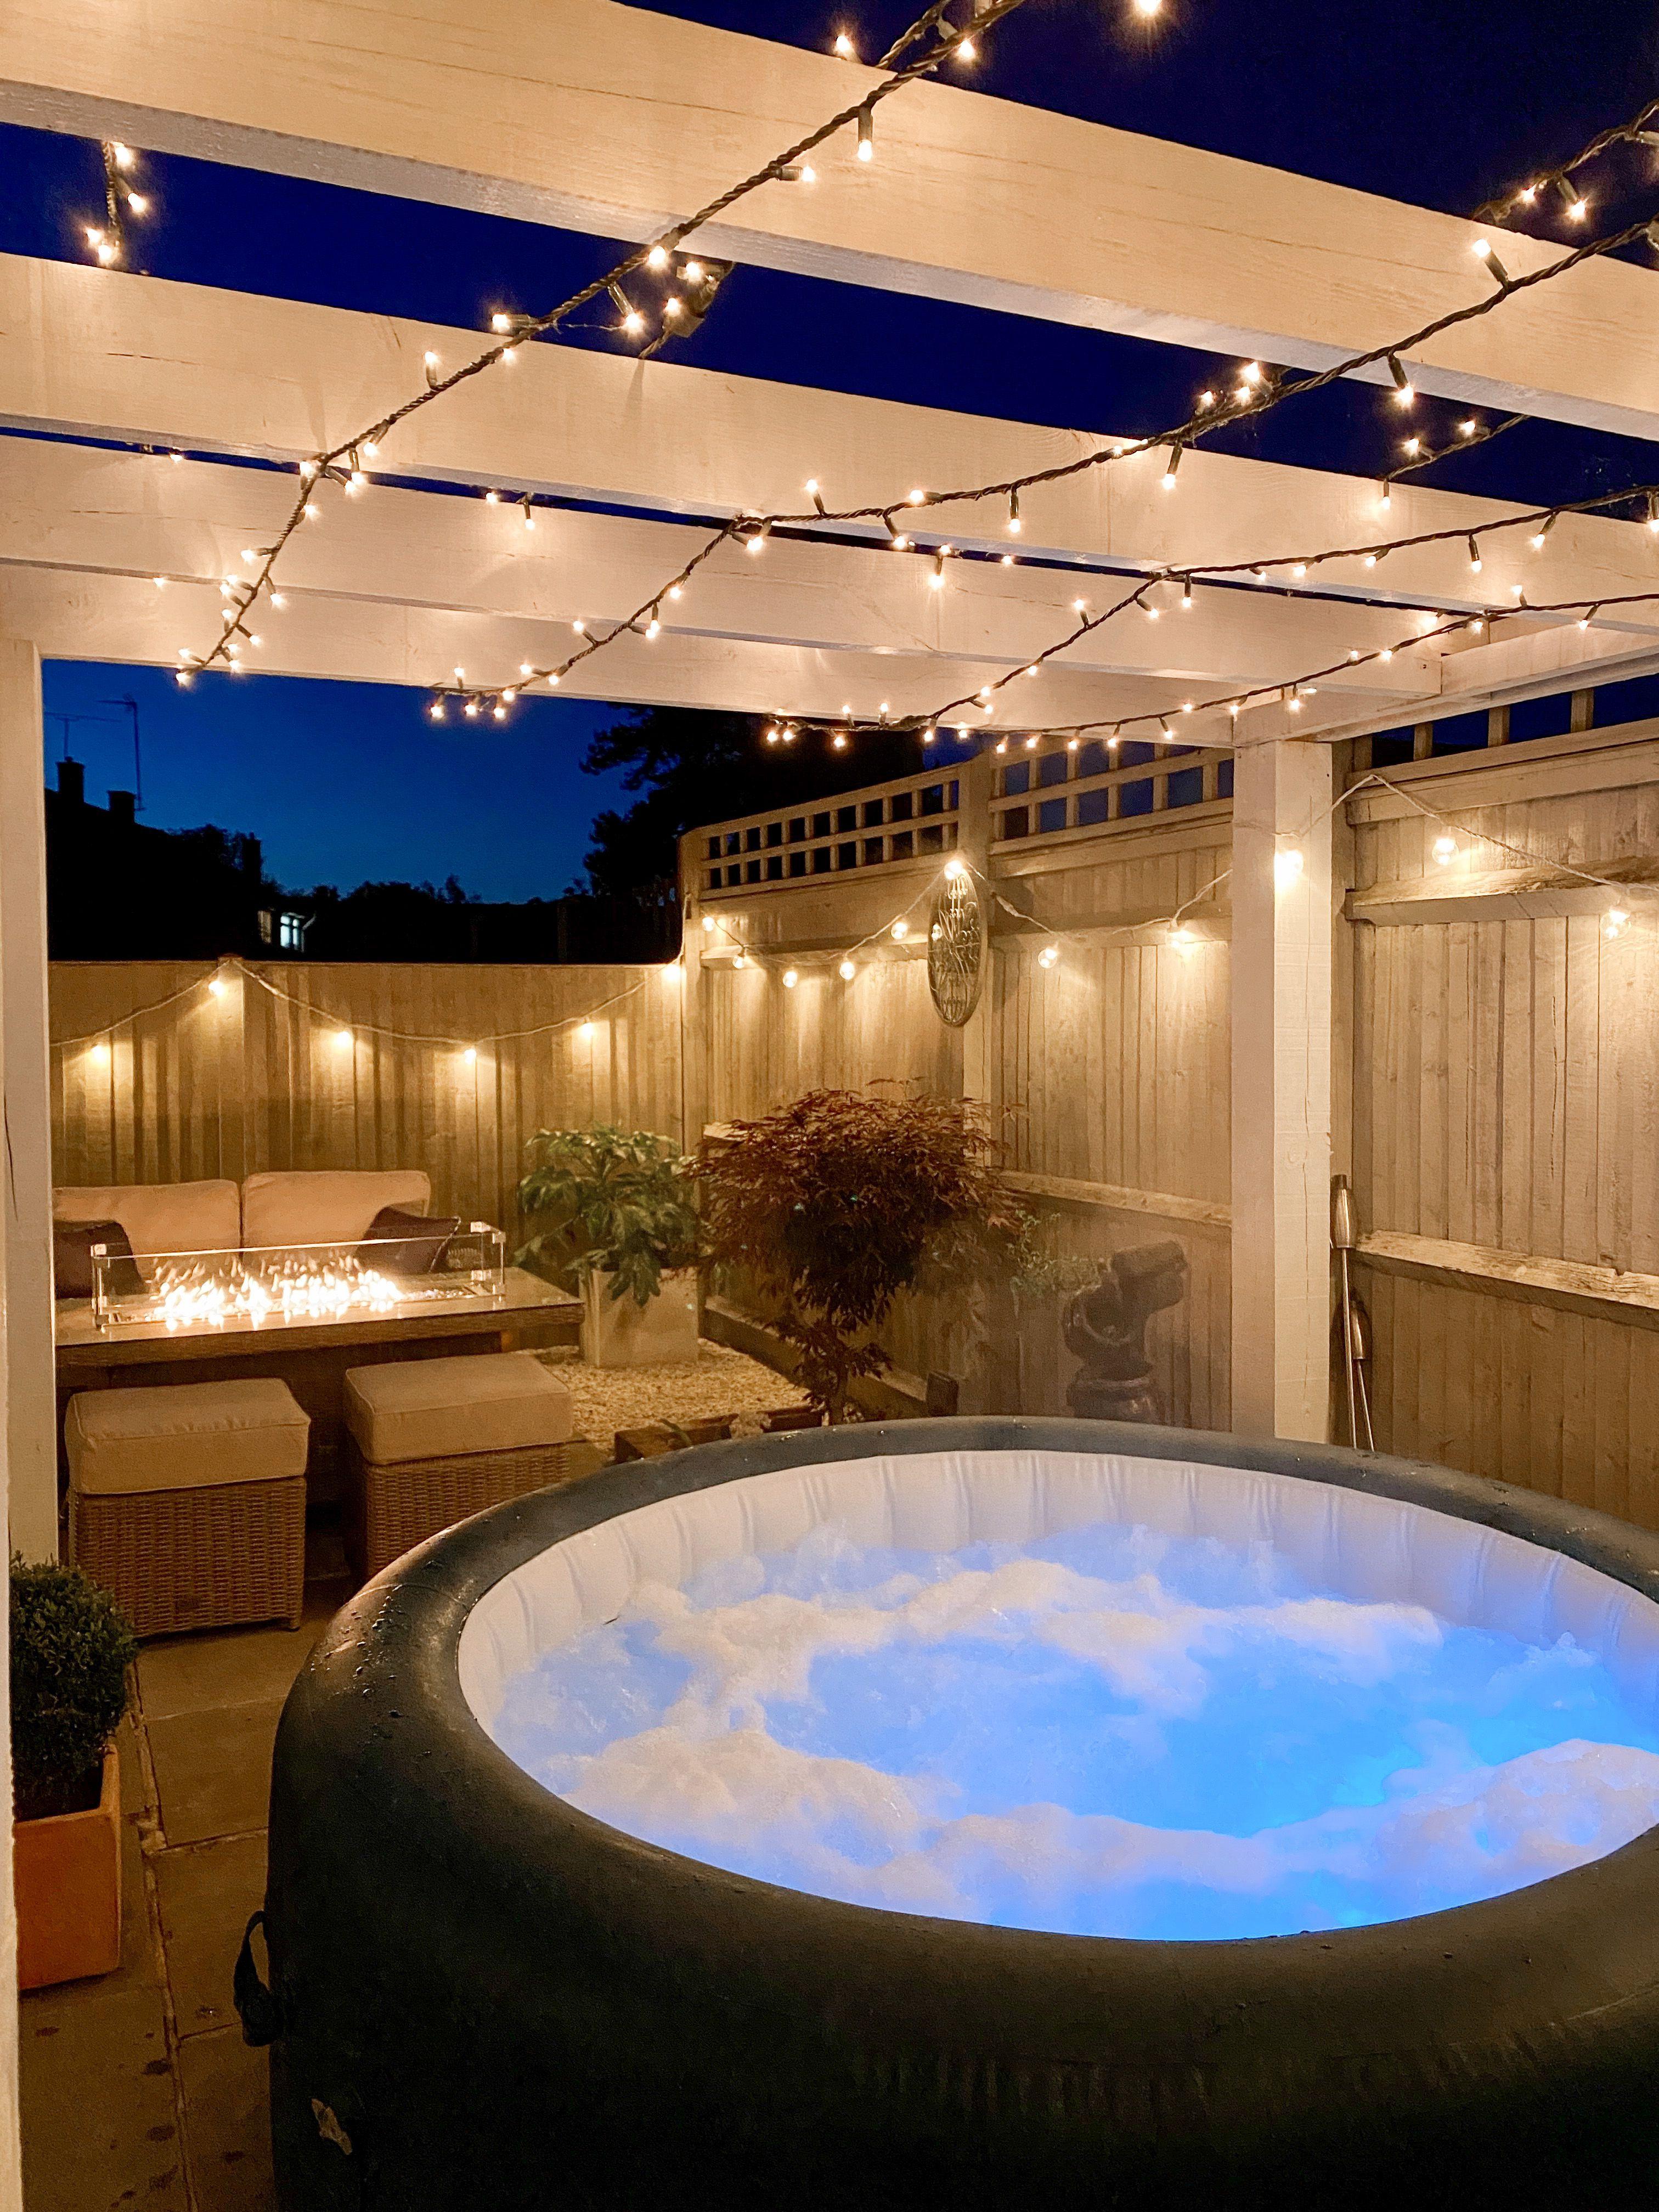 Patio Garden With Hot Tub Pergola And Fairy Lights Hot Tub Backyard Hot Tub Garden Hot Tub Pergola